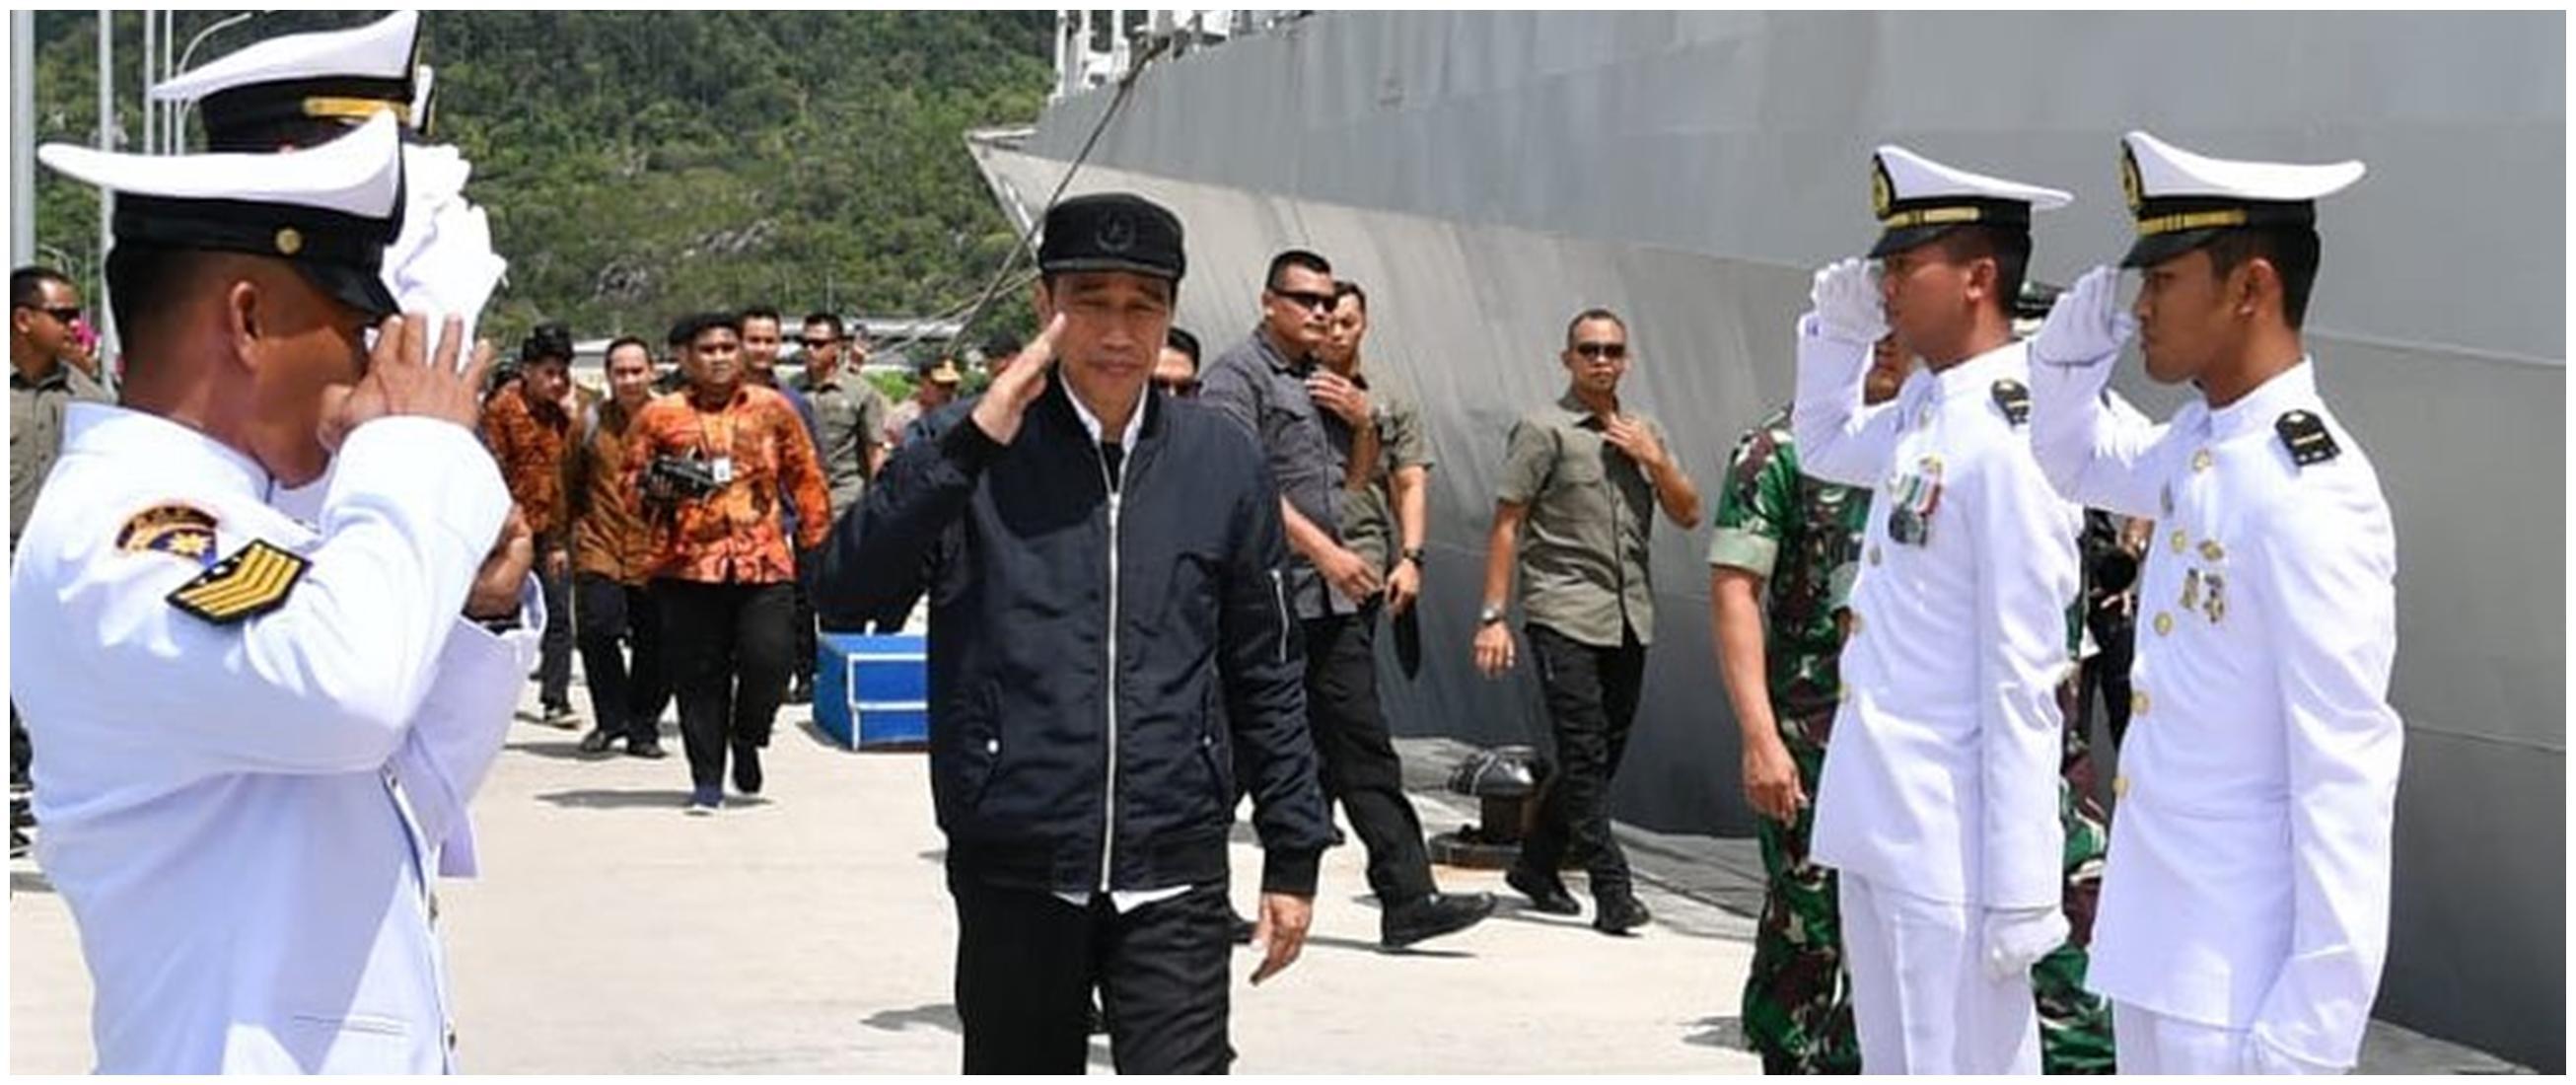 10 Momen Presiden Jokowi ke Natuna di tengah tensi panas RI-China